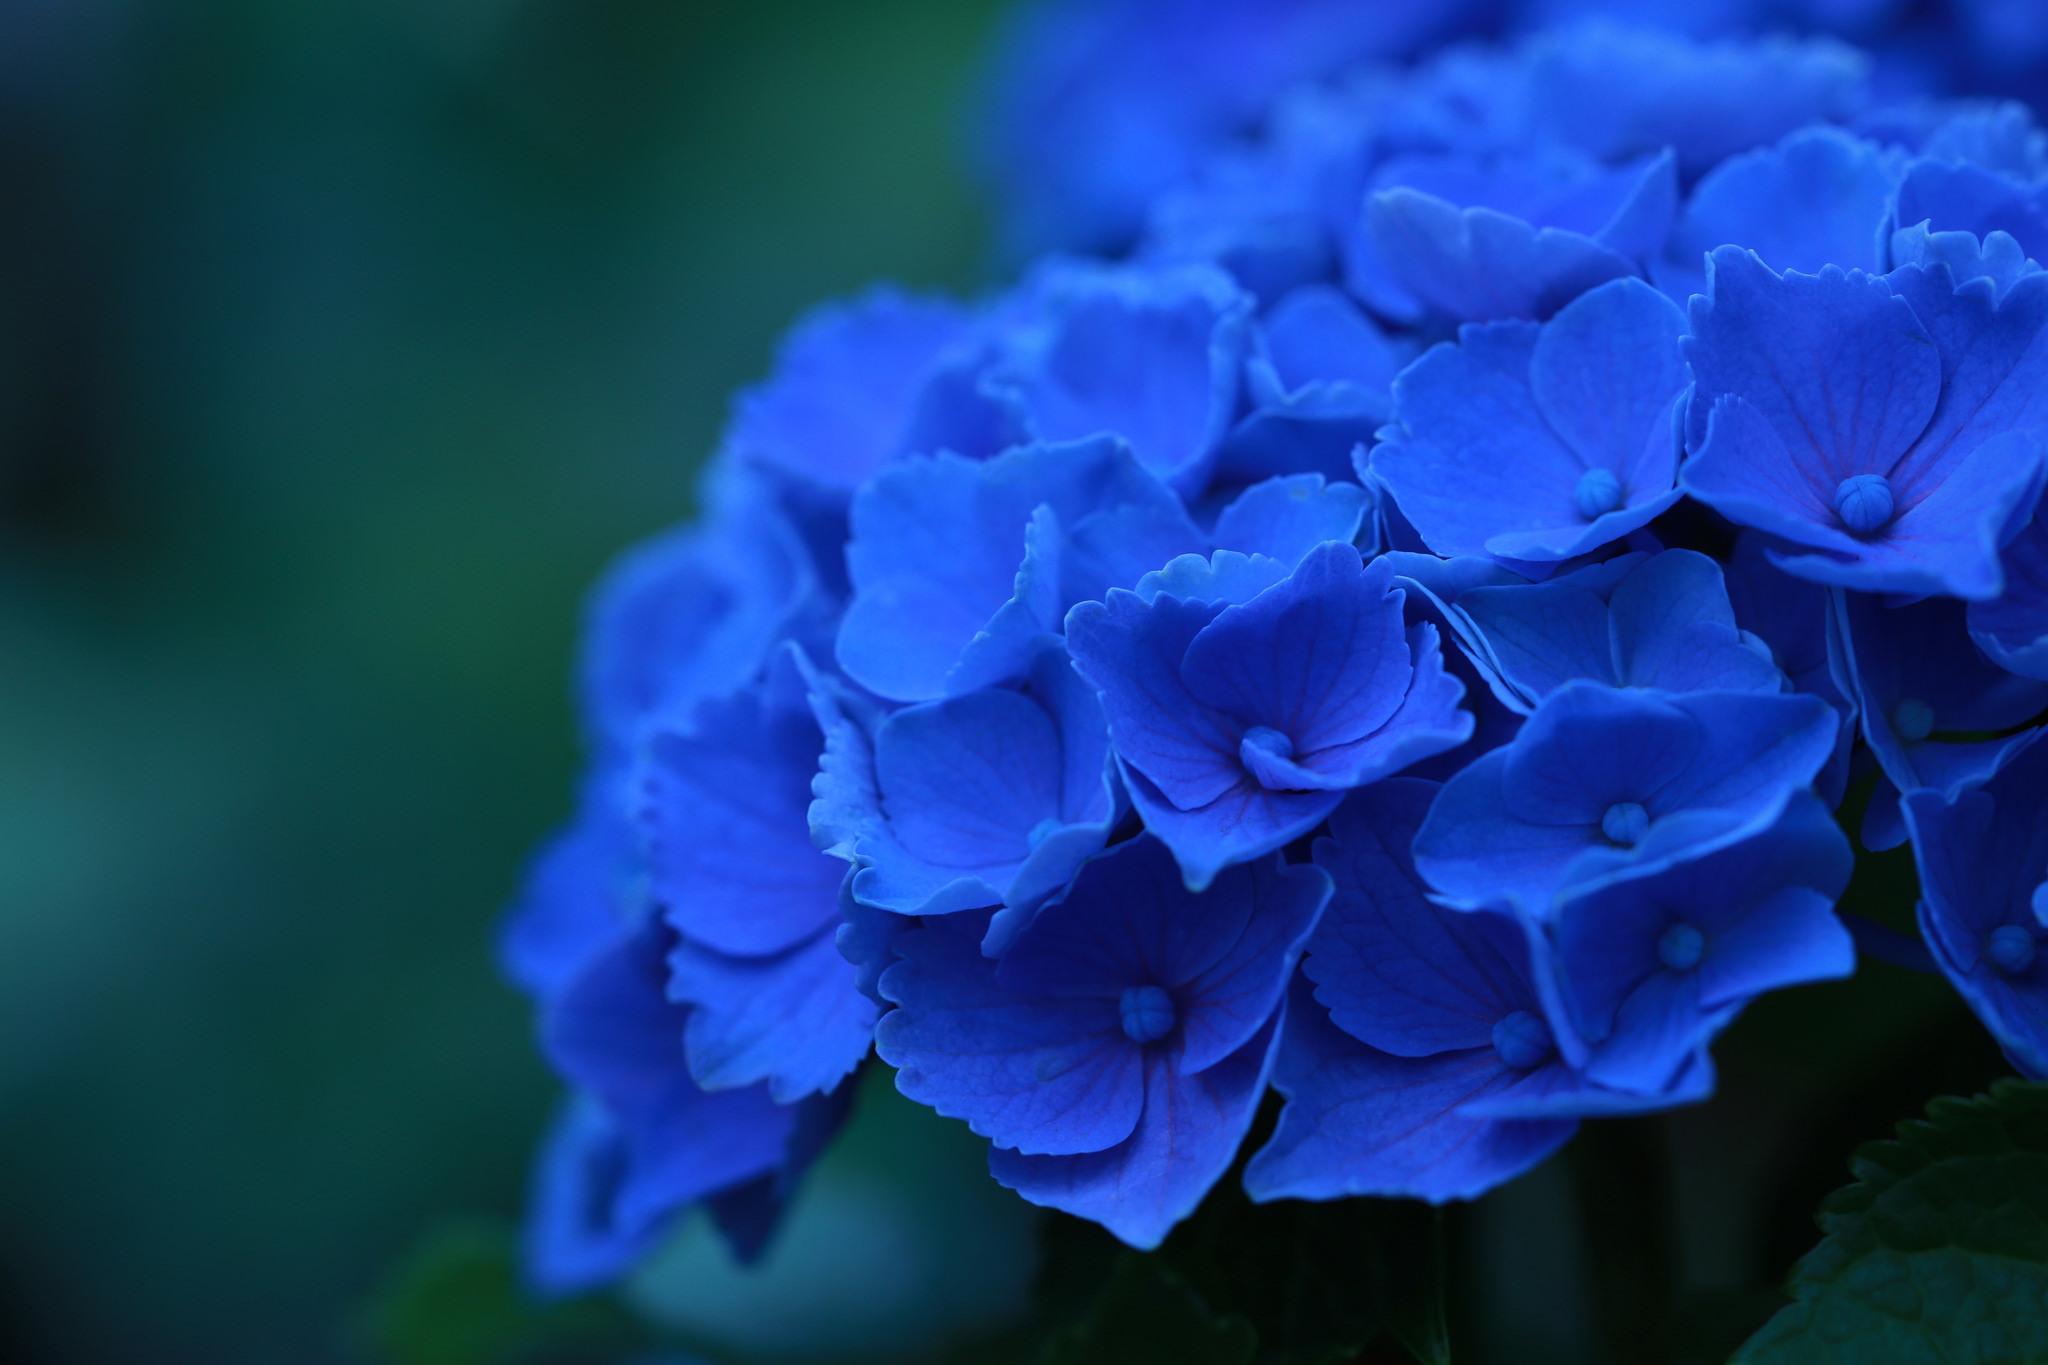 بالصور صور ورد , خلفيات جميله جدا للورد 411 13